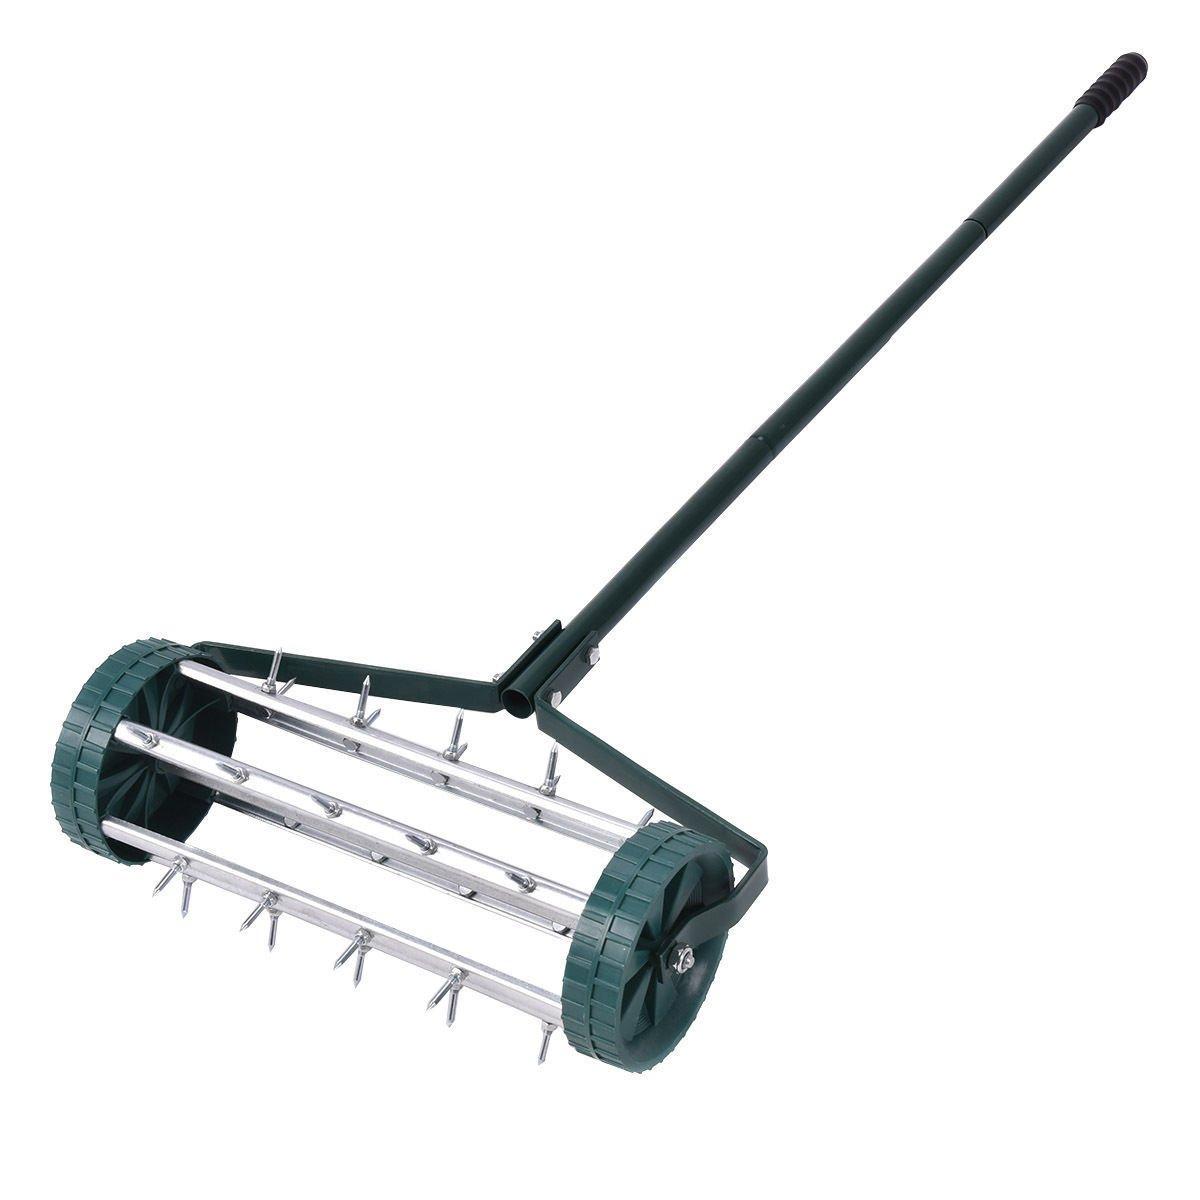 Heavy Duty Rolling Garden Lawn Aerator Roller Home Grass Steel Handle Green